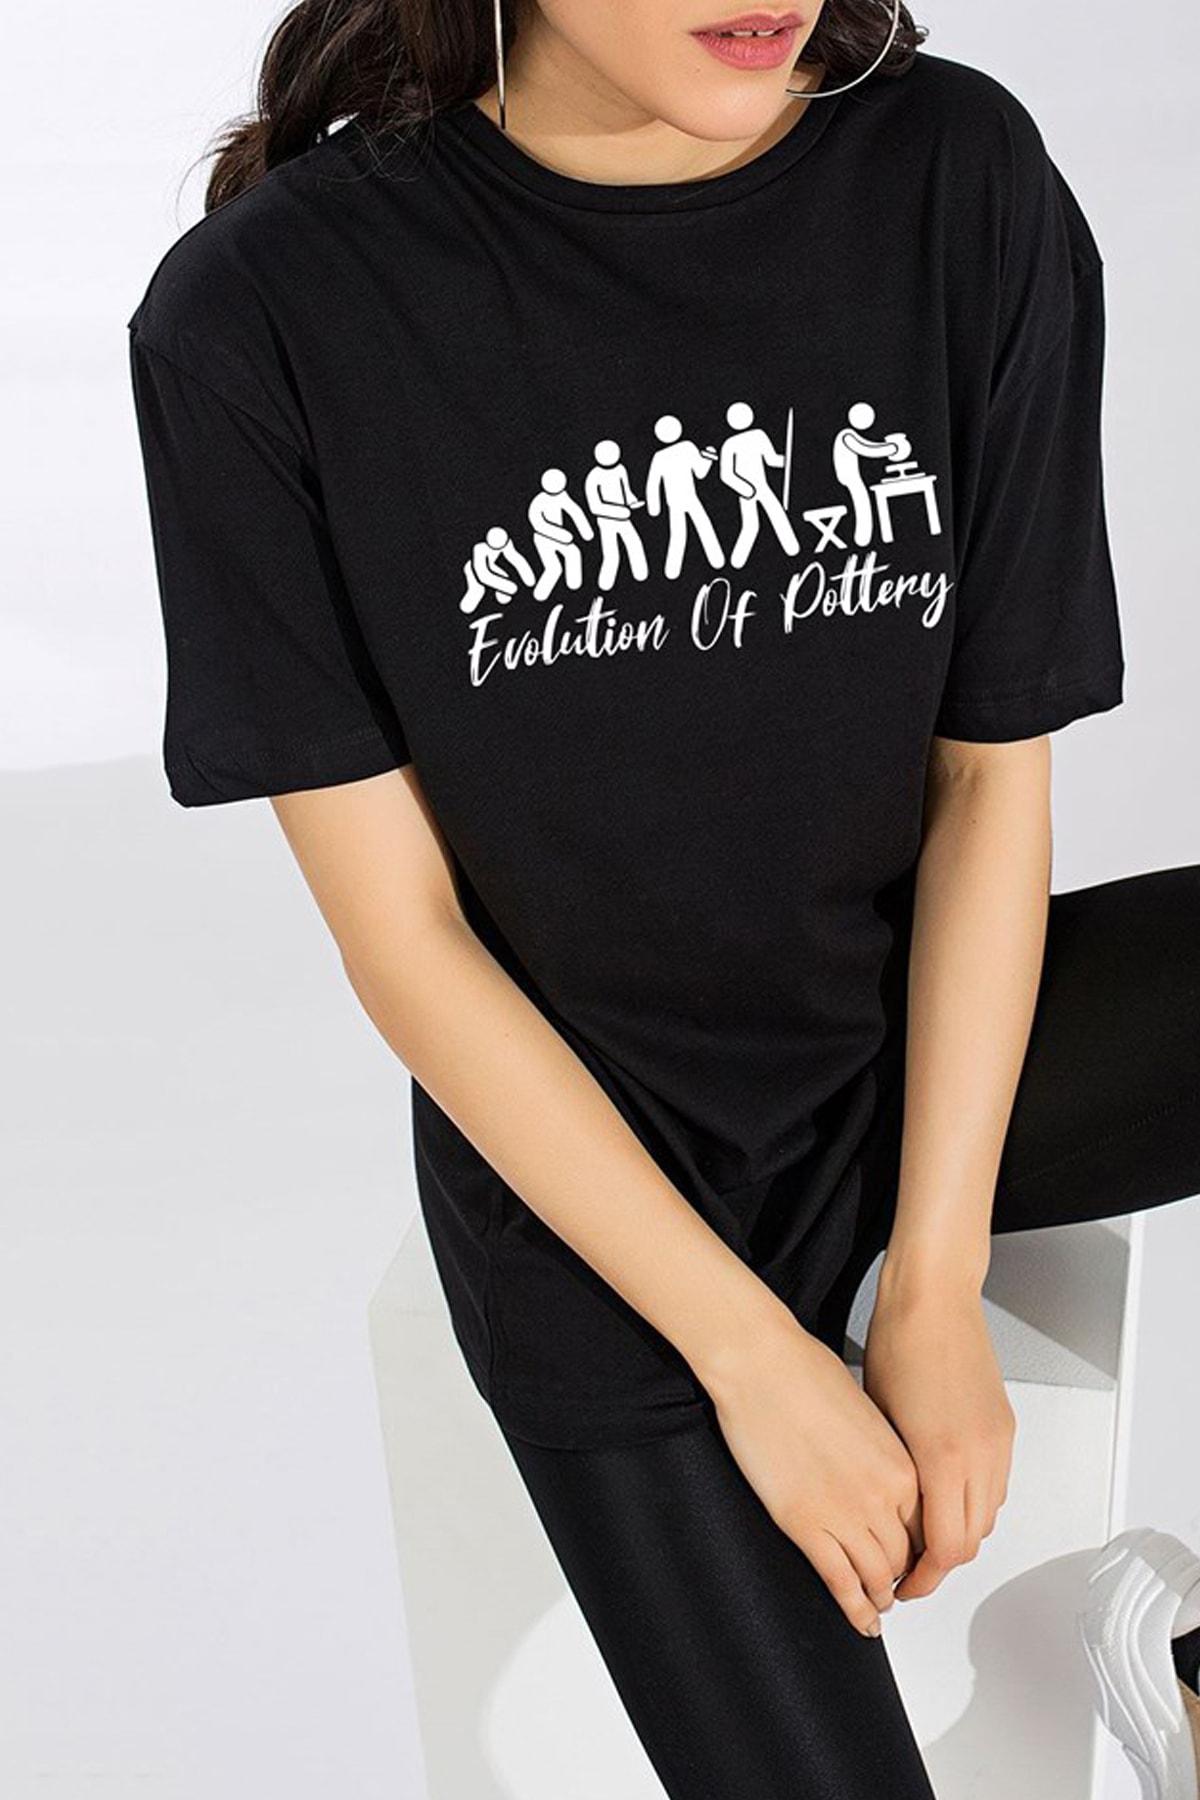 Ref-San Unisex Siyah Tasarım T-shirt - Evolution Of Pottery 2